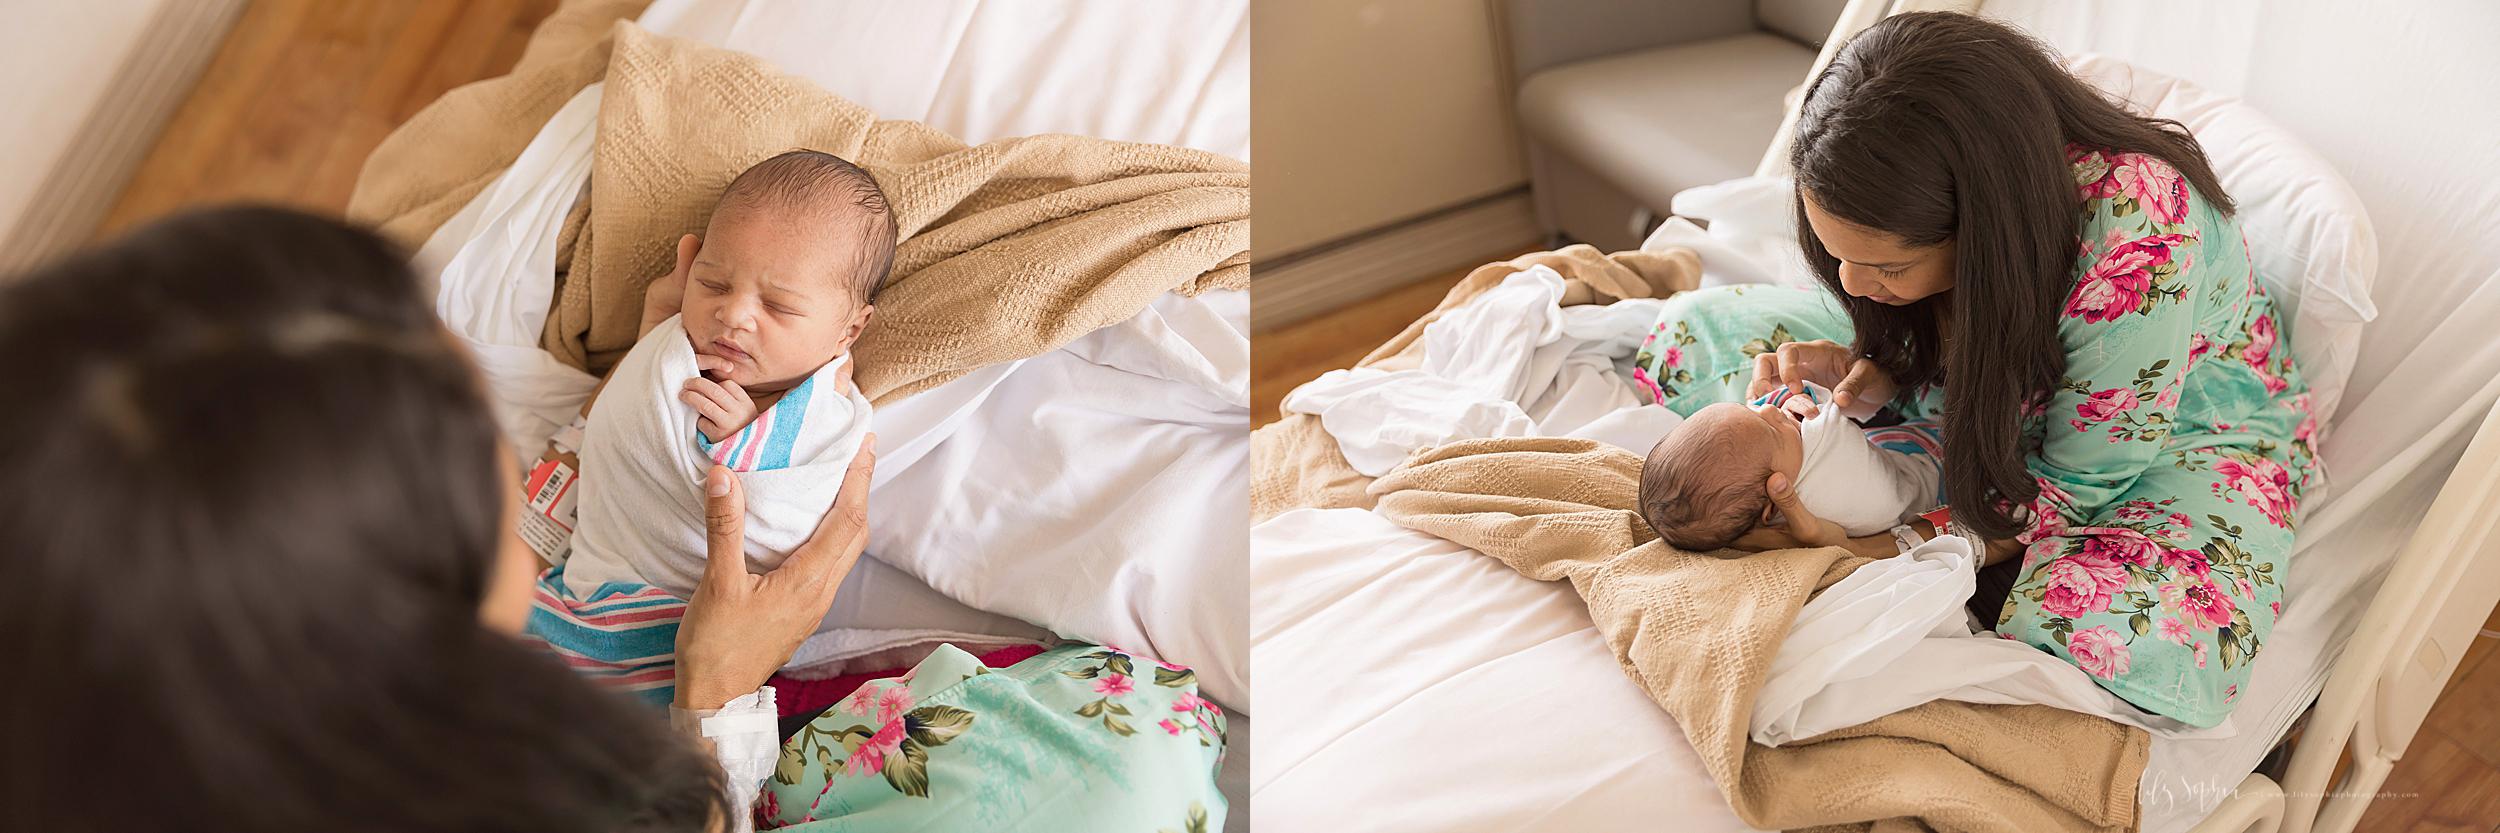 atlanta-midtown-brookhaven-decatur-lily-sophia-photography-photographer-portraits-grant-park-family-atlanta-medical-center-fresh-48-hospital-newborn-photos-lifestyle-big-brothers_0088.jpg